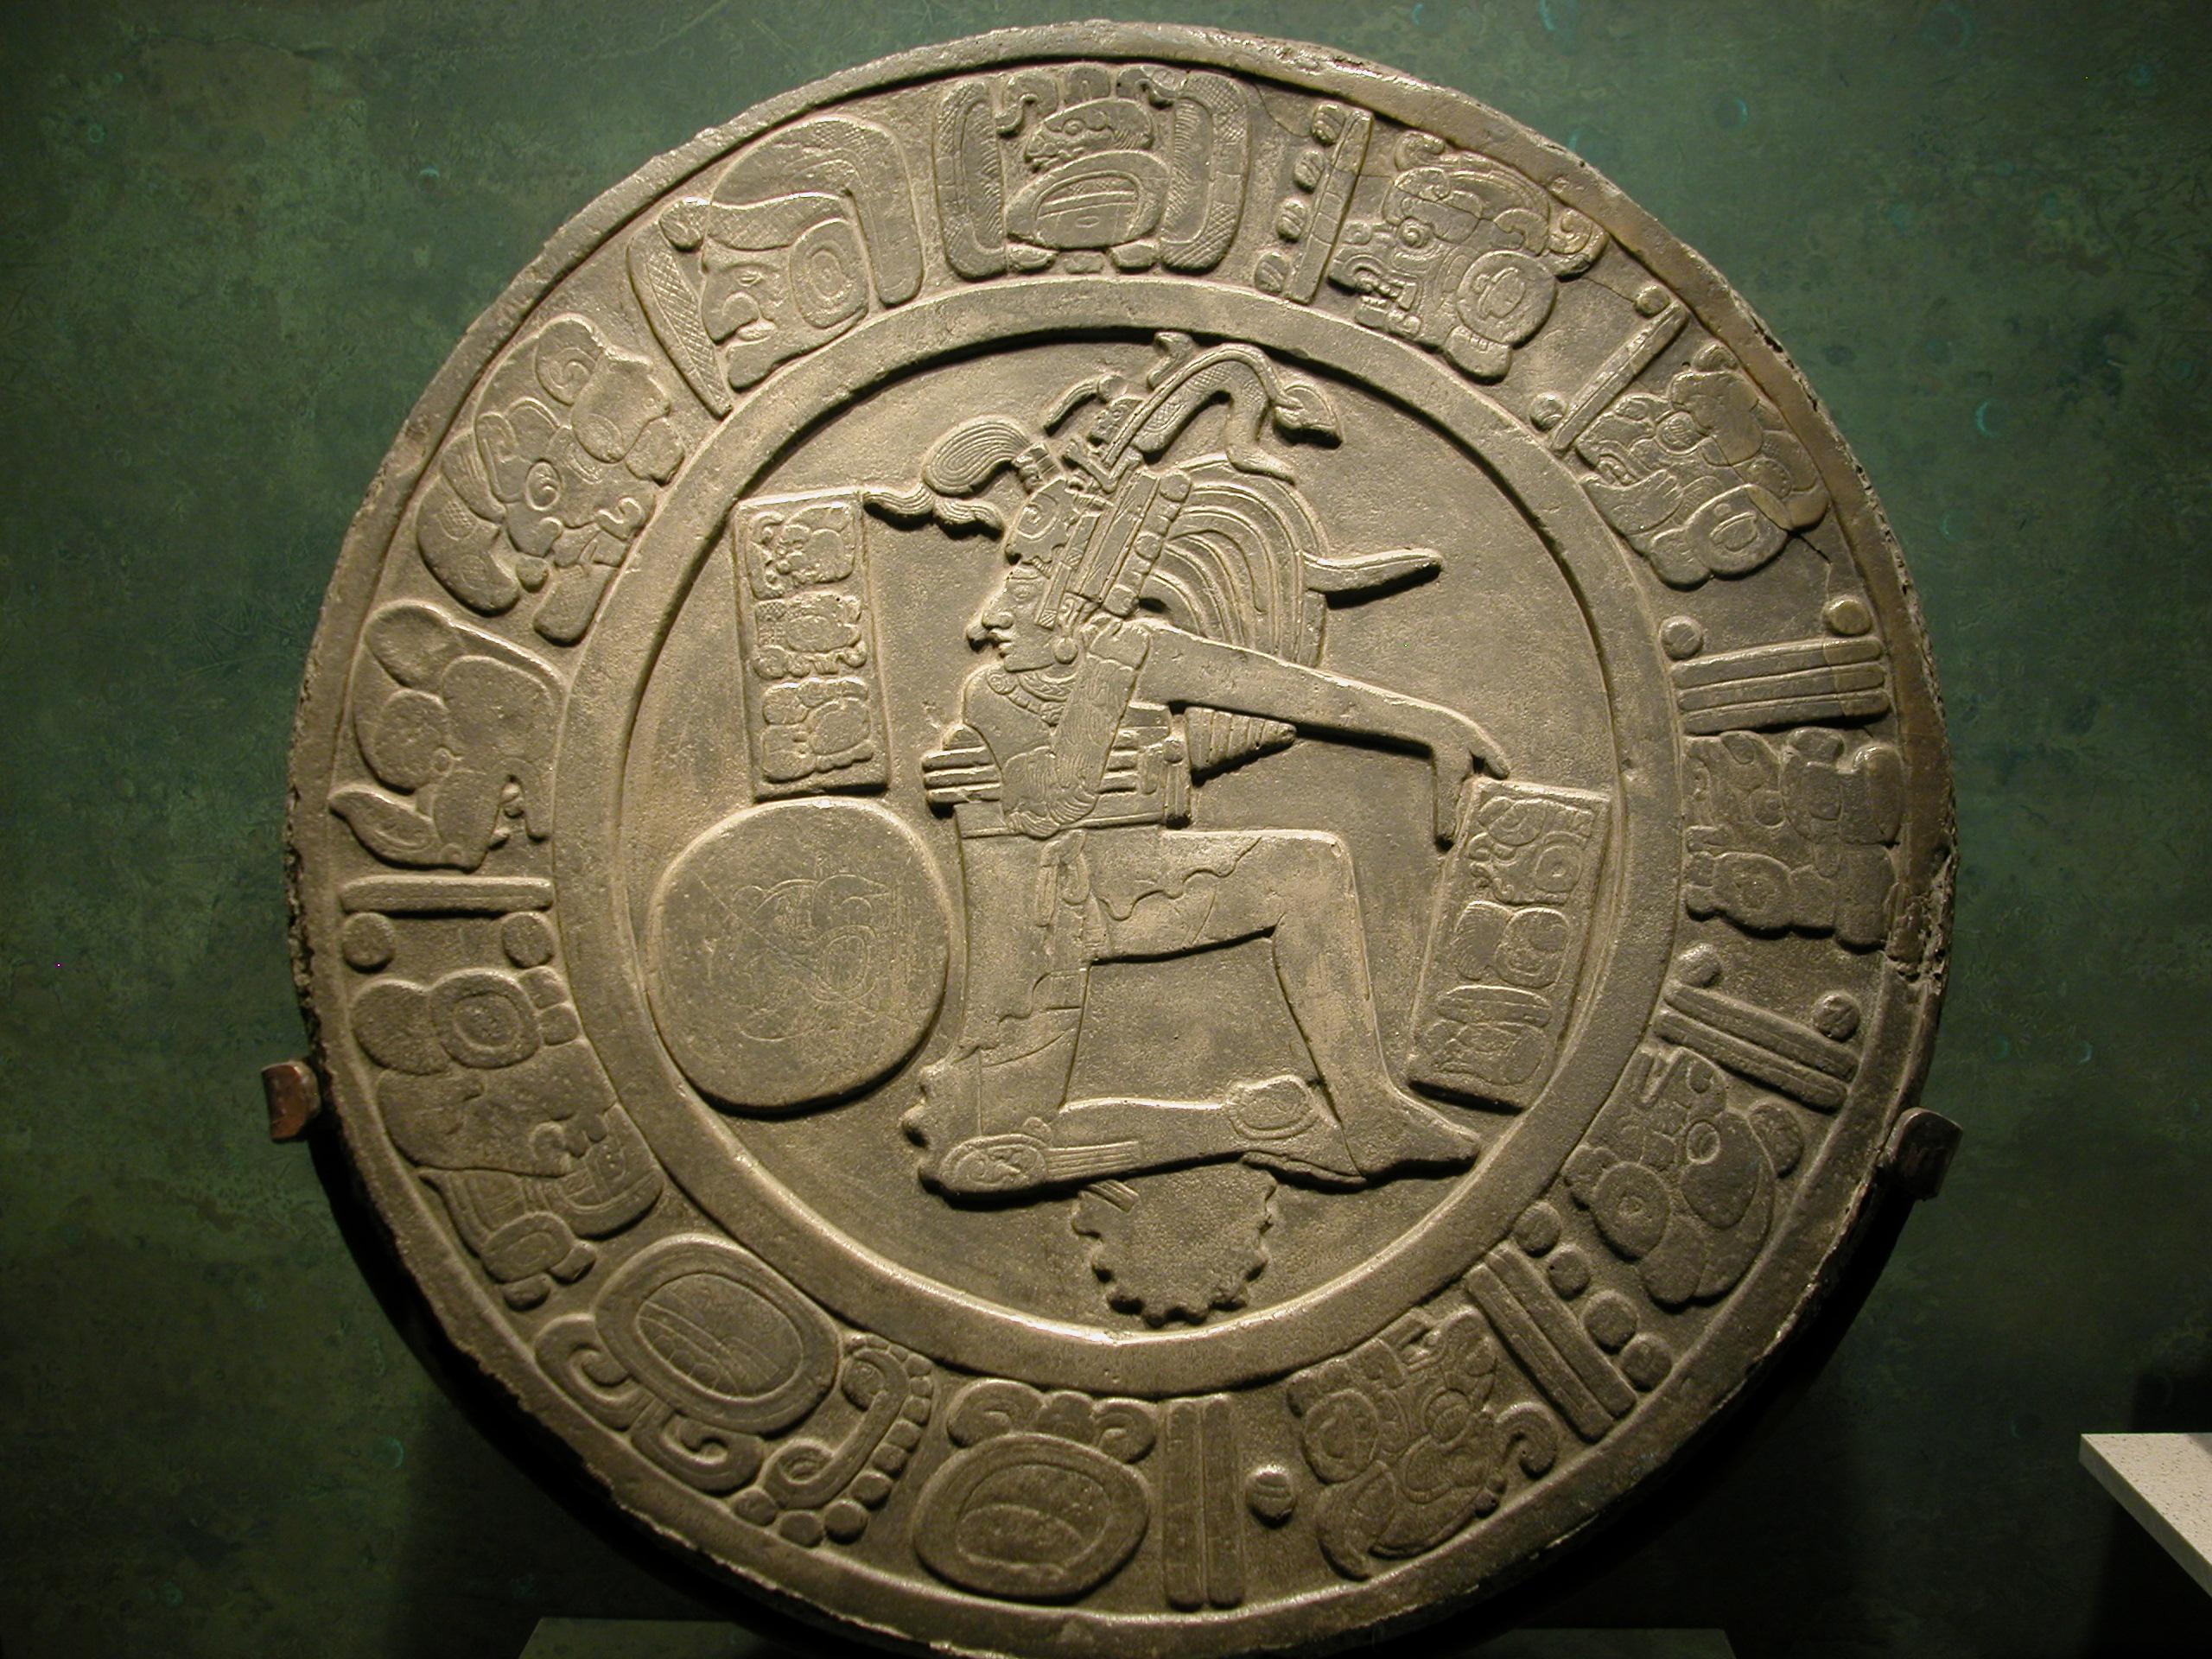 Piedra de Chinkultic